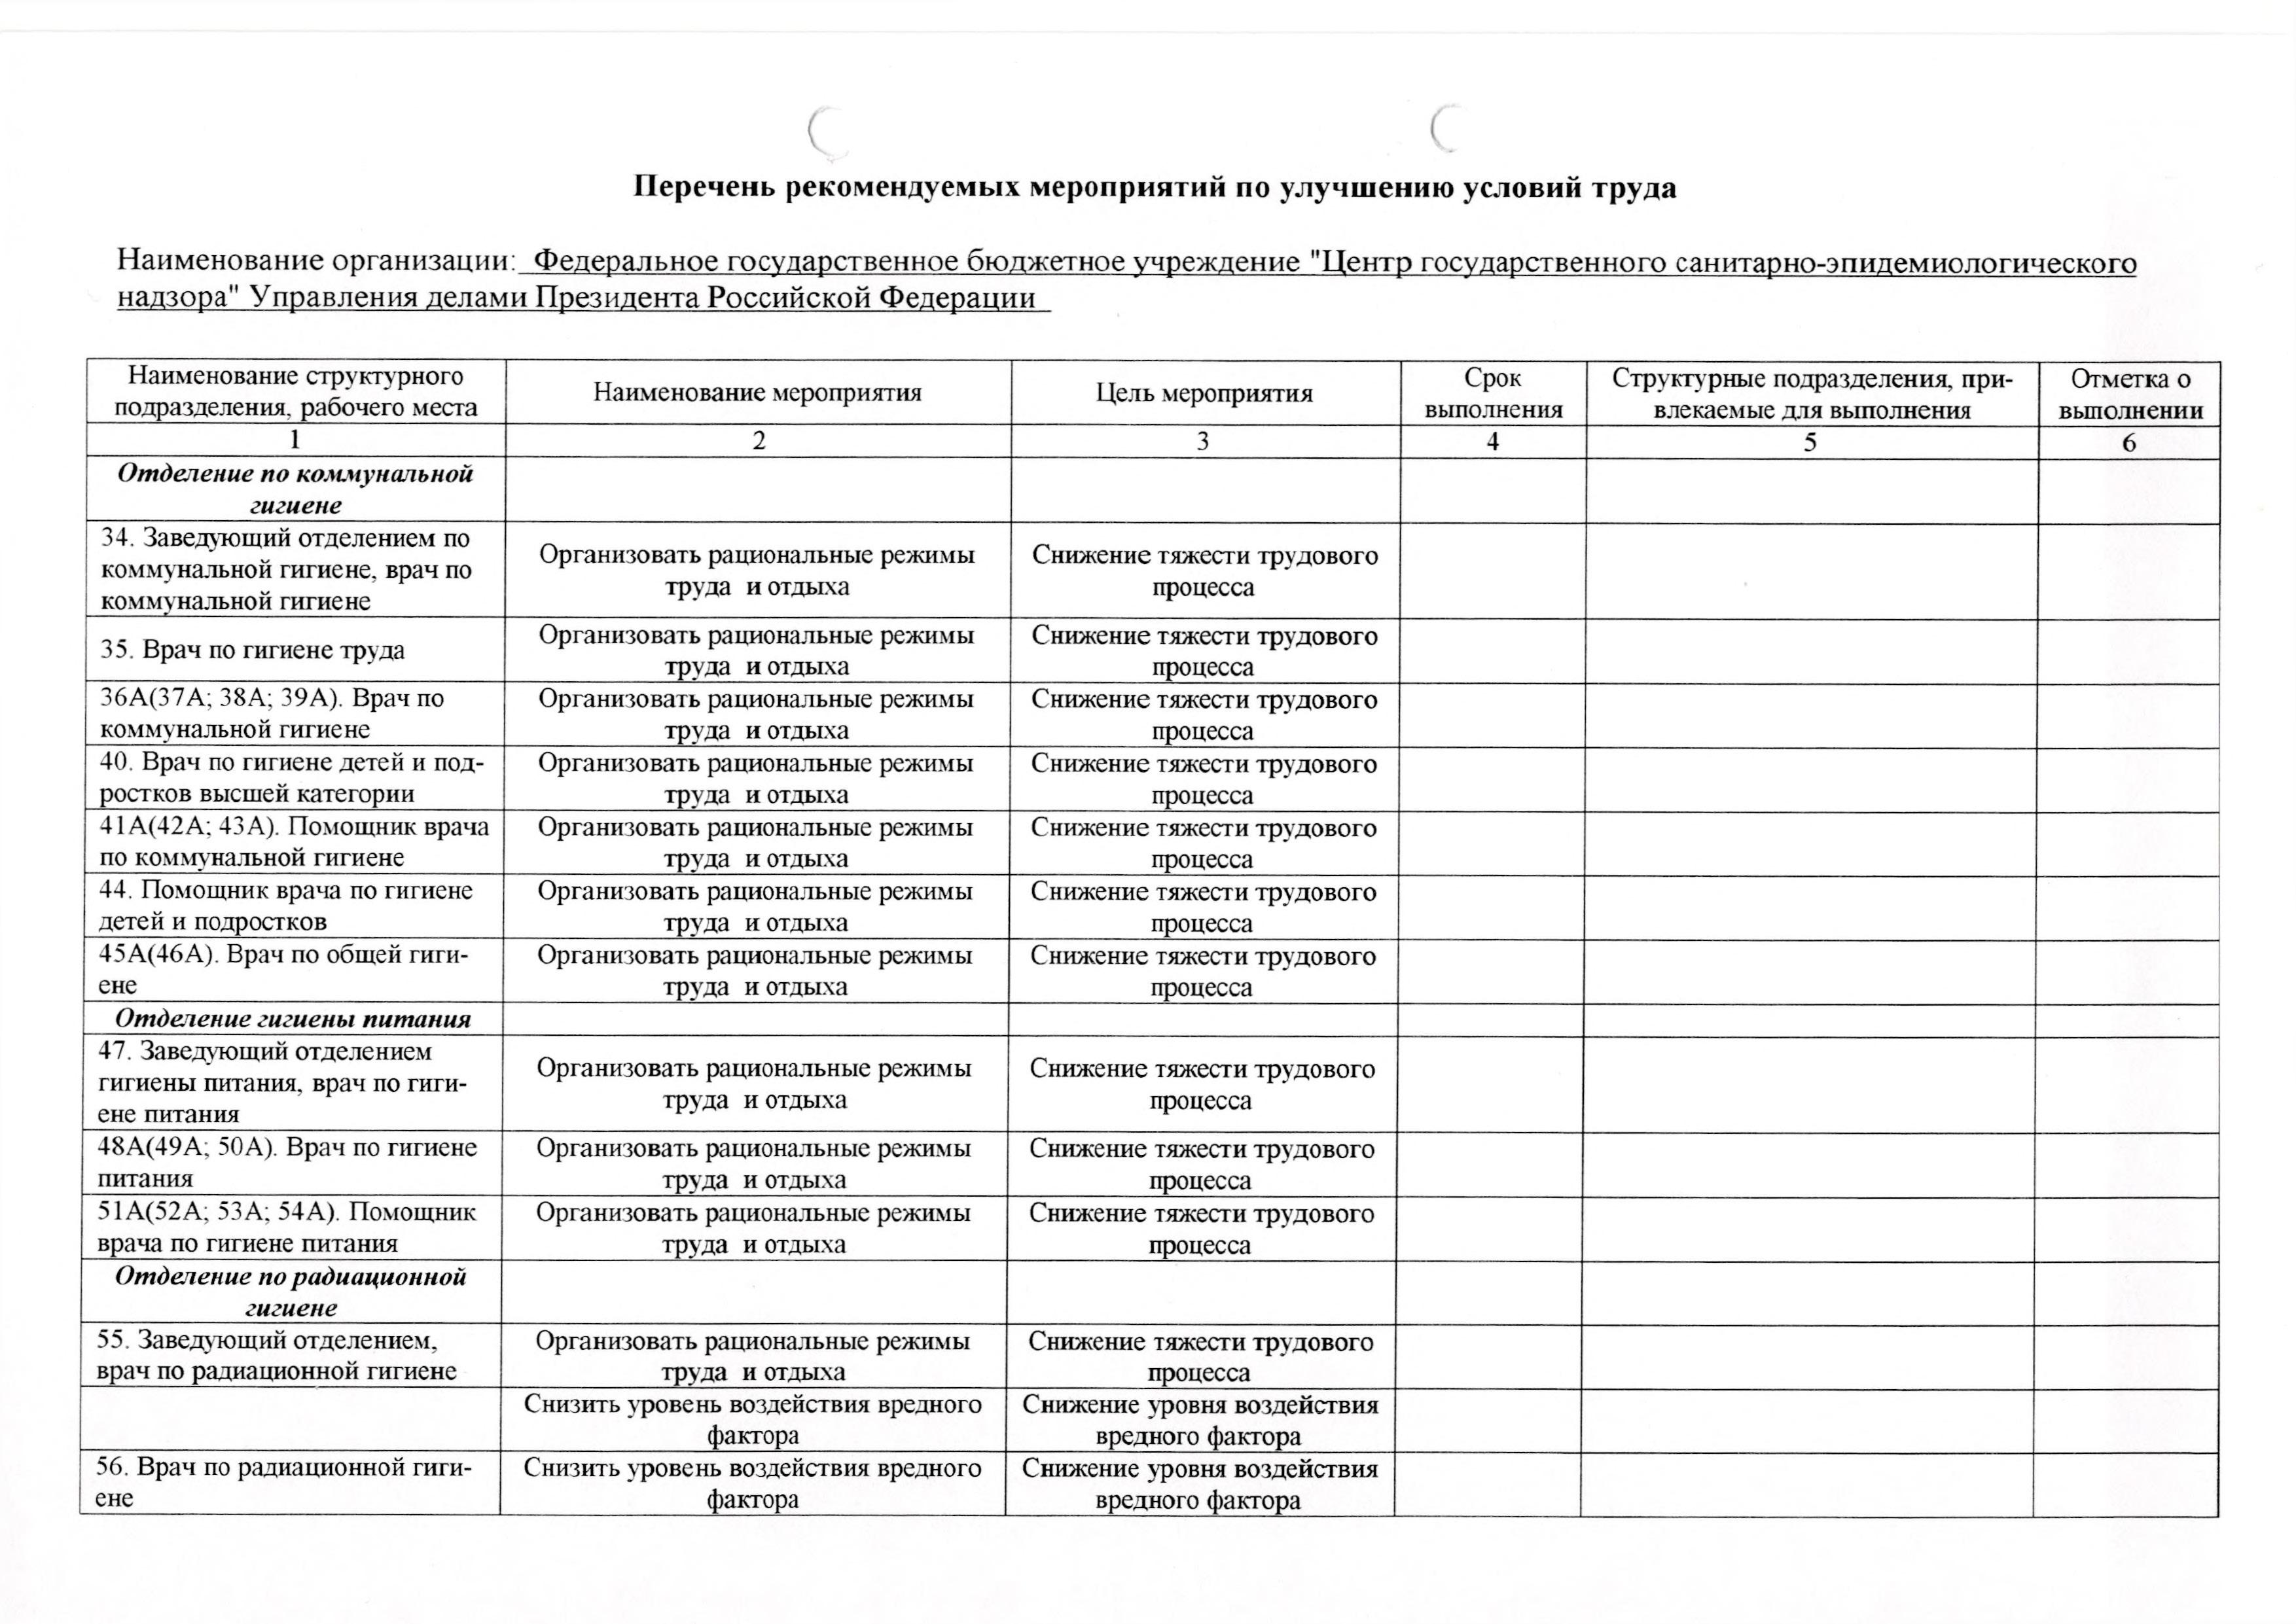 Реестр медицинских книжек Москва Бутырский